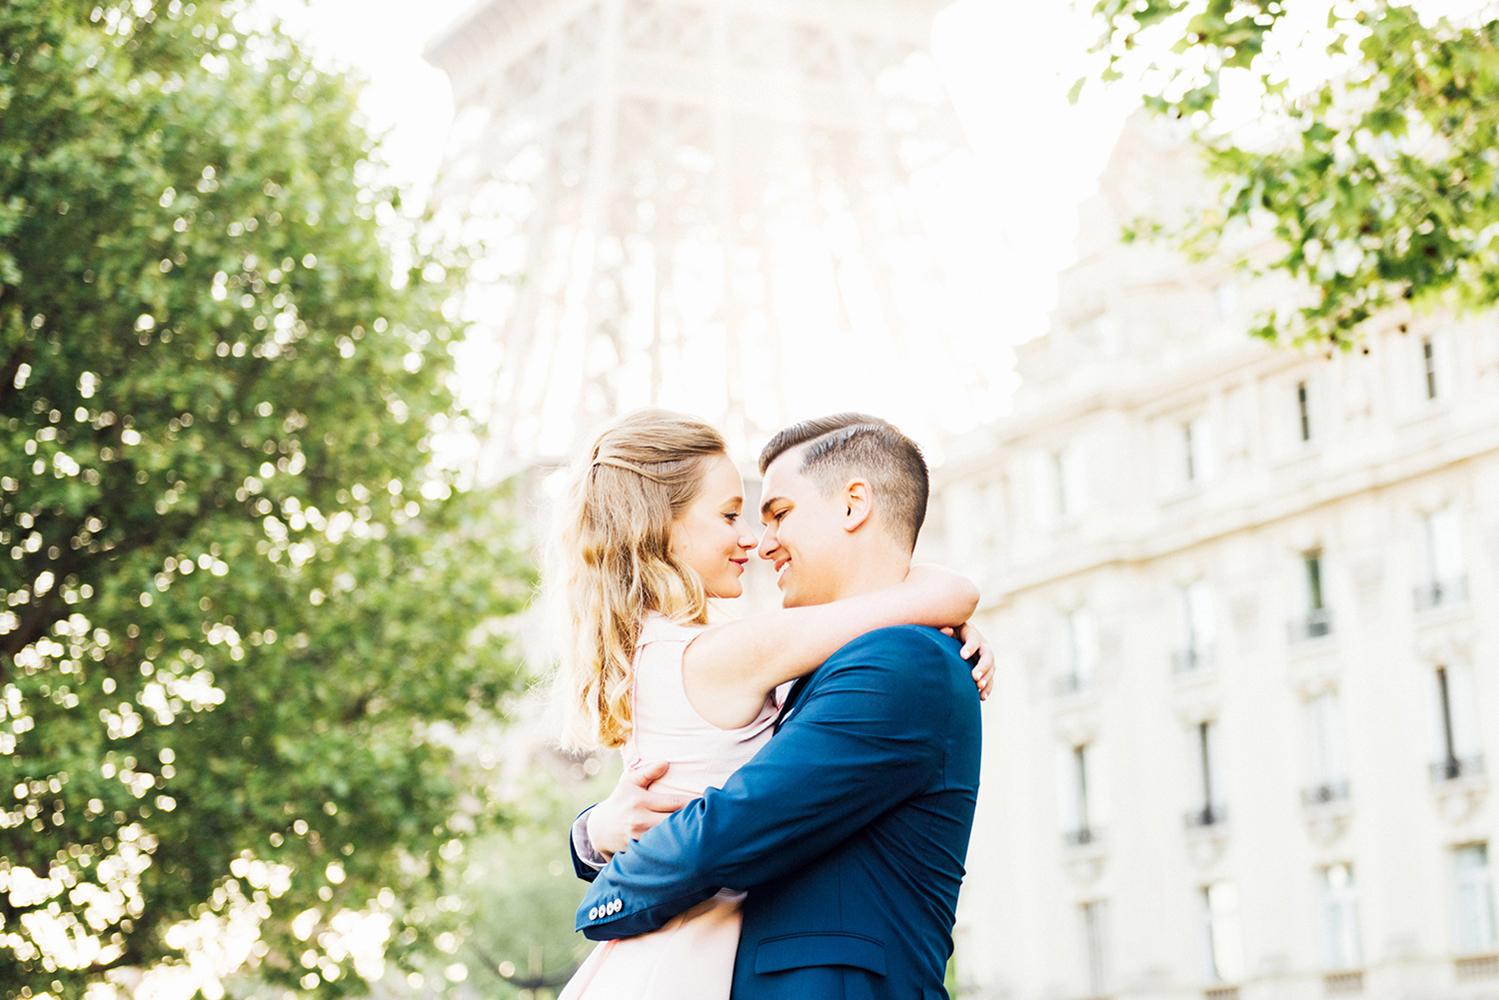 Katie_Mitchell_Paris_France_Engagement_Photographer_06.jpg